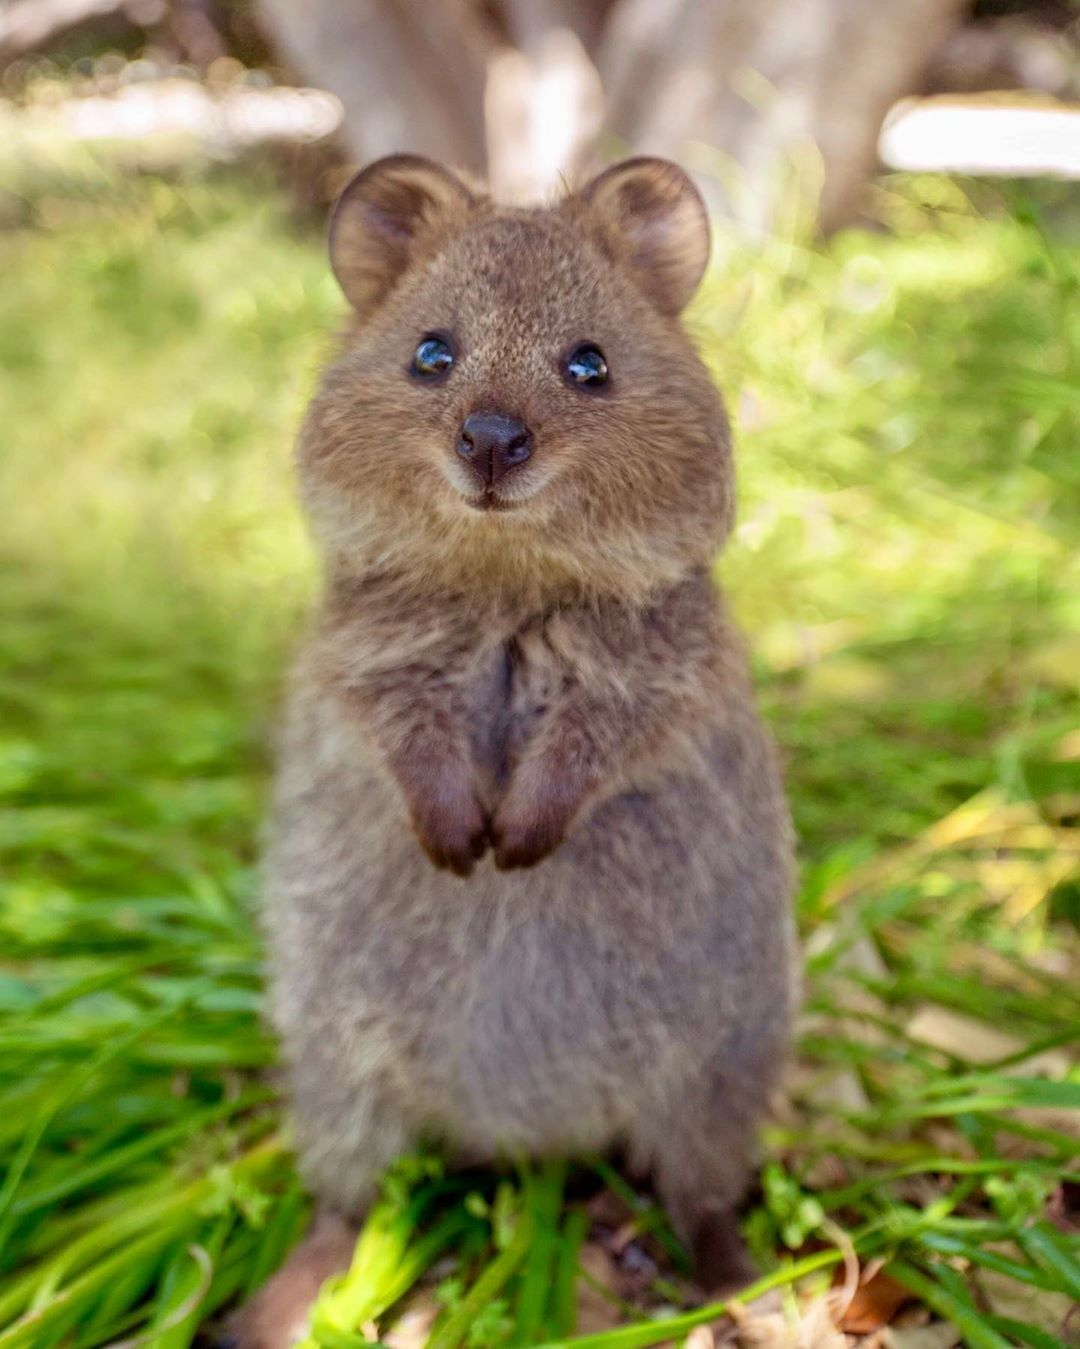 Happinessbtq Posted To Instagram Nature Inspirations Tag A Friend Via Cruzysuzy Cute Anim Niedliche Tiere Tiere Wilde Tiere